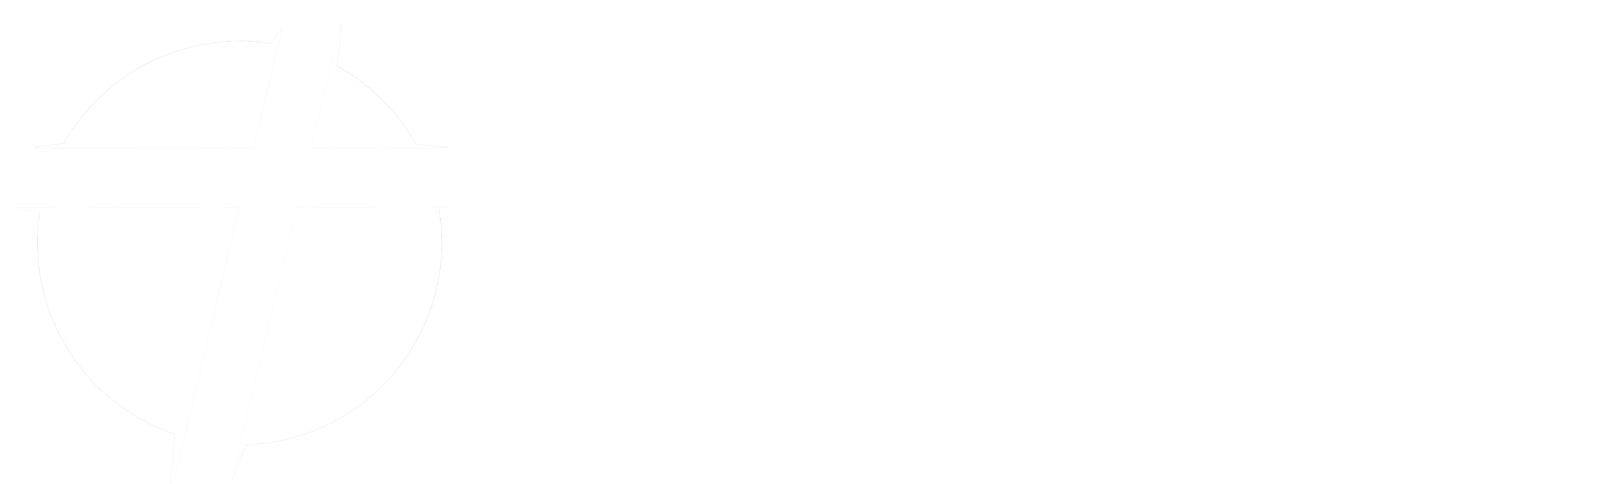 CLF LOGO EXP